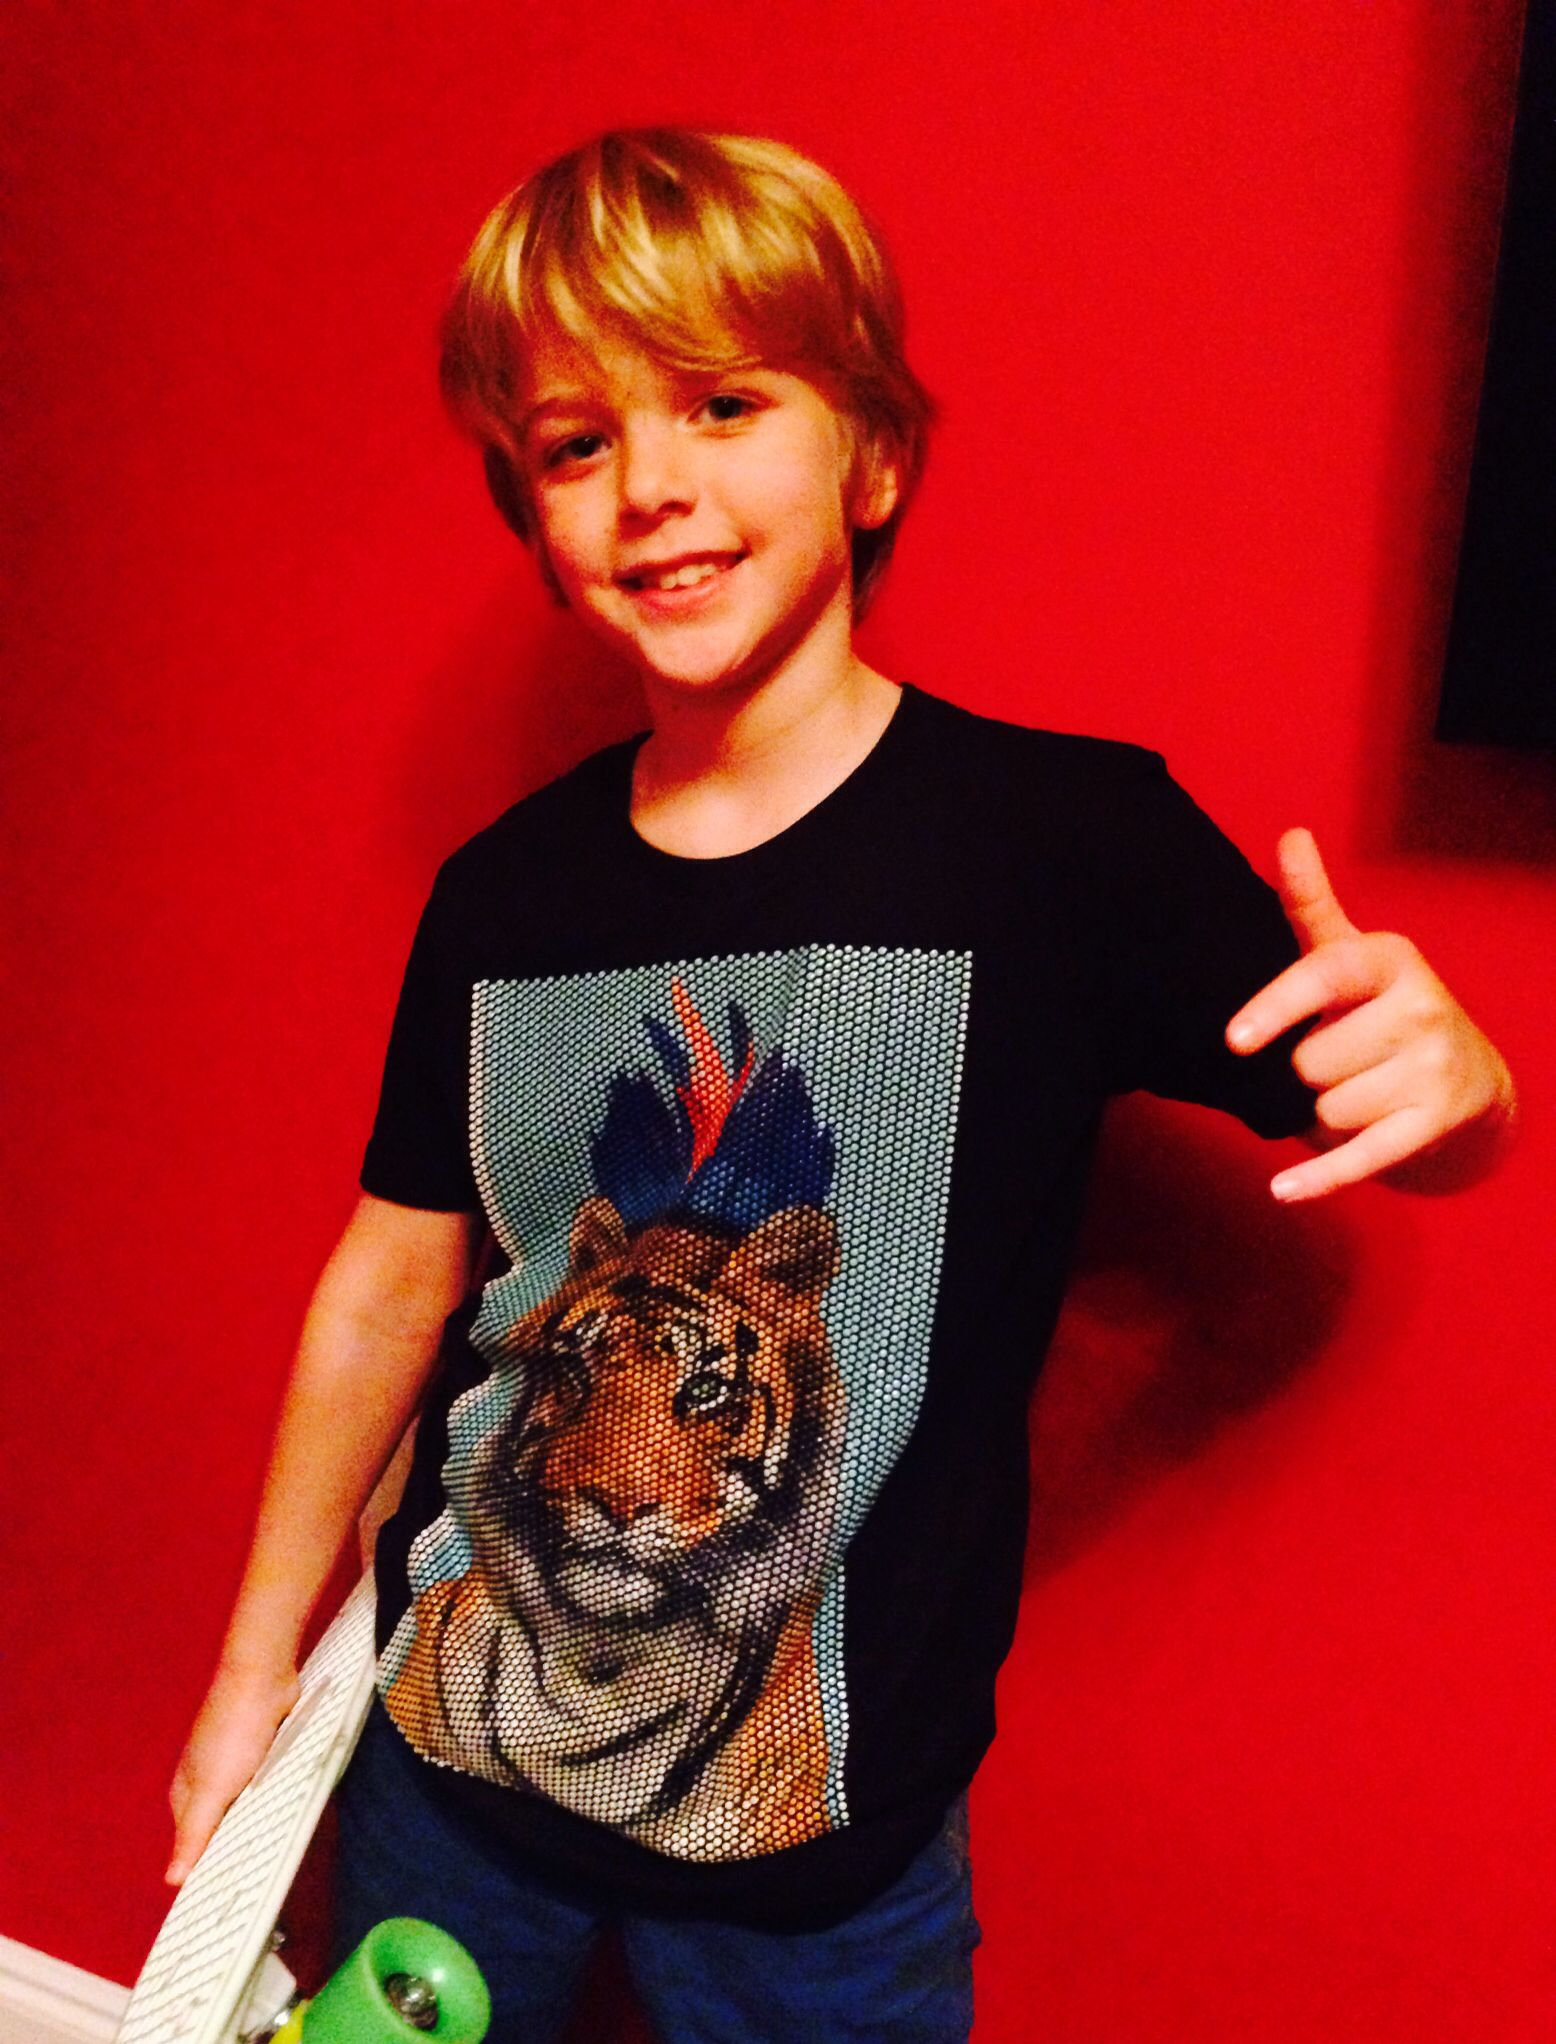 #newprint #alert #cakokids new #tiger #headdress #print #fashion #available #now #fun #boys #style